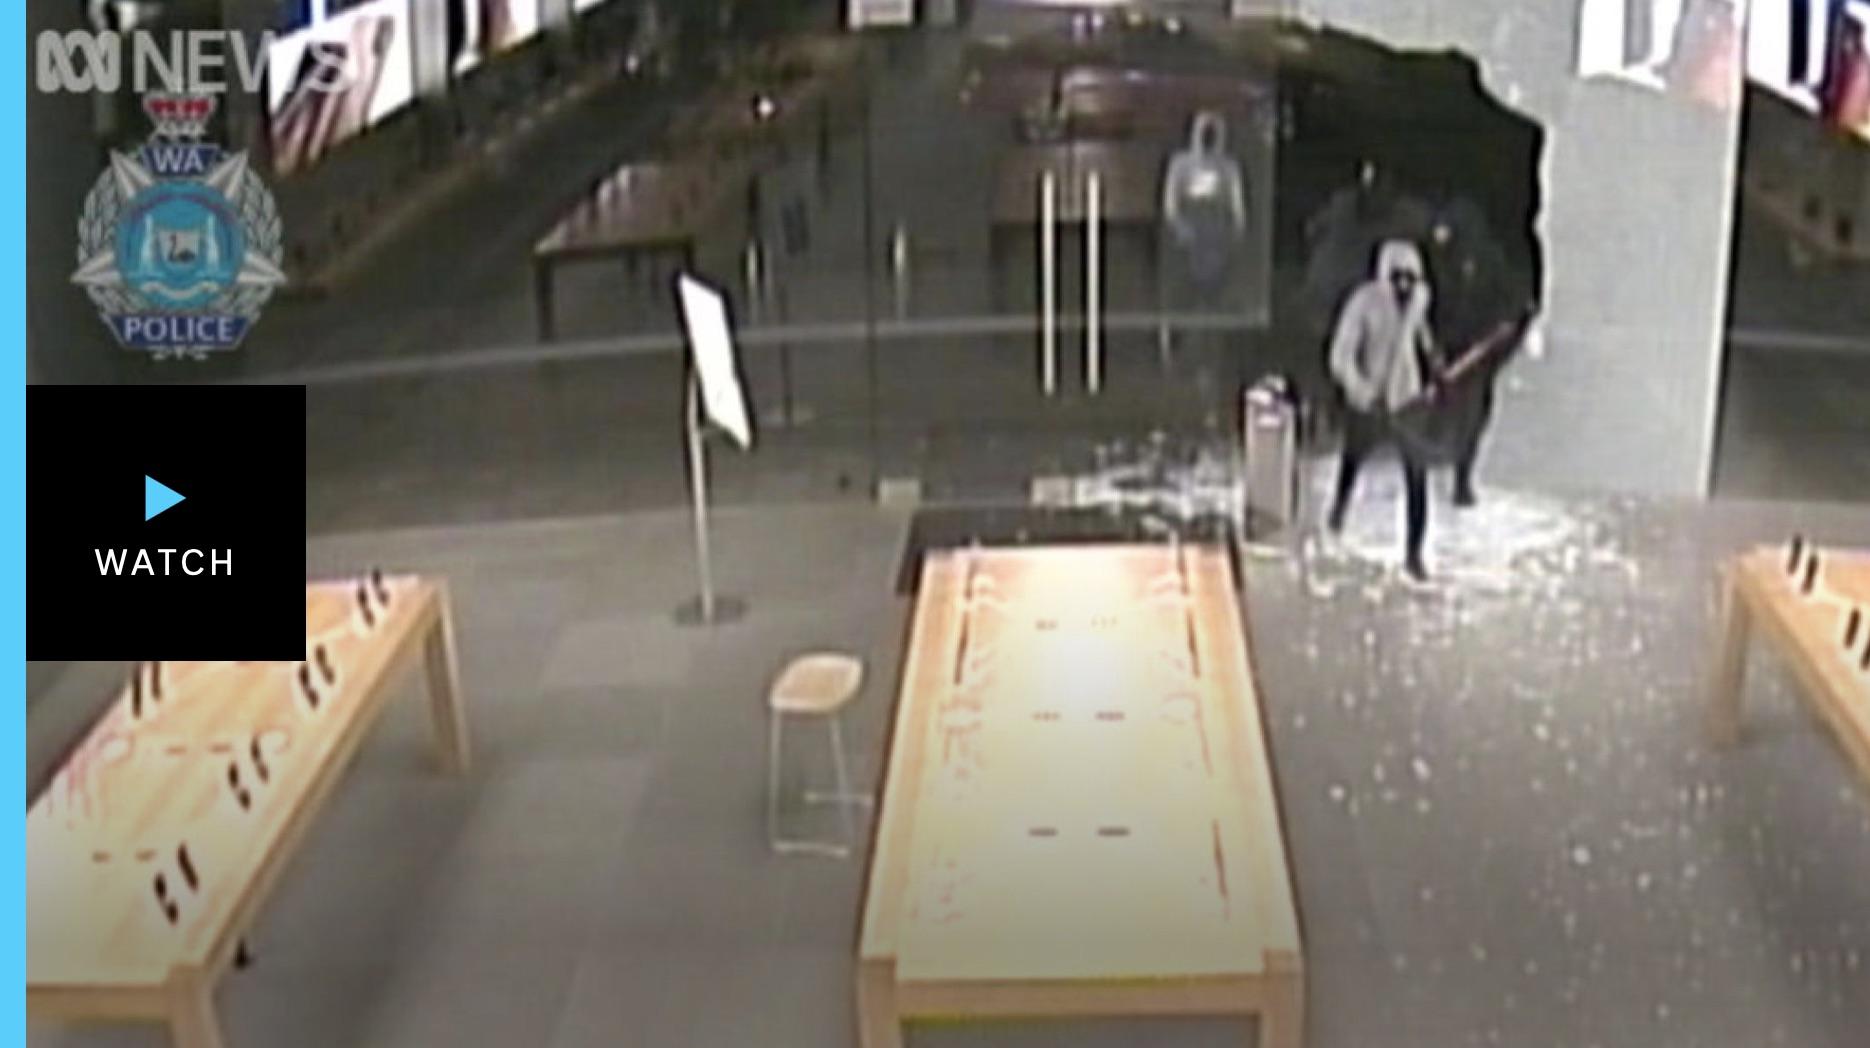 Apple Store thieves steal $300K sledgehammer